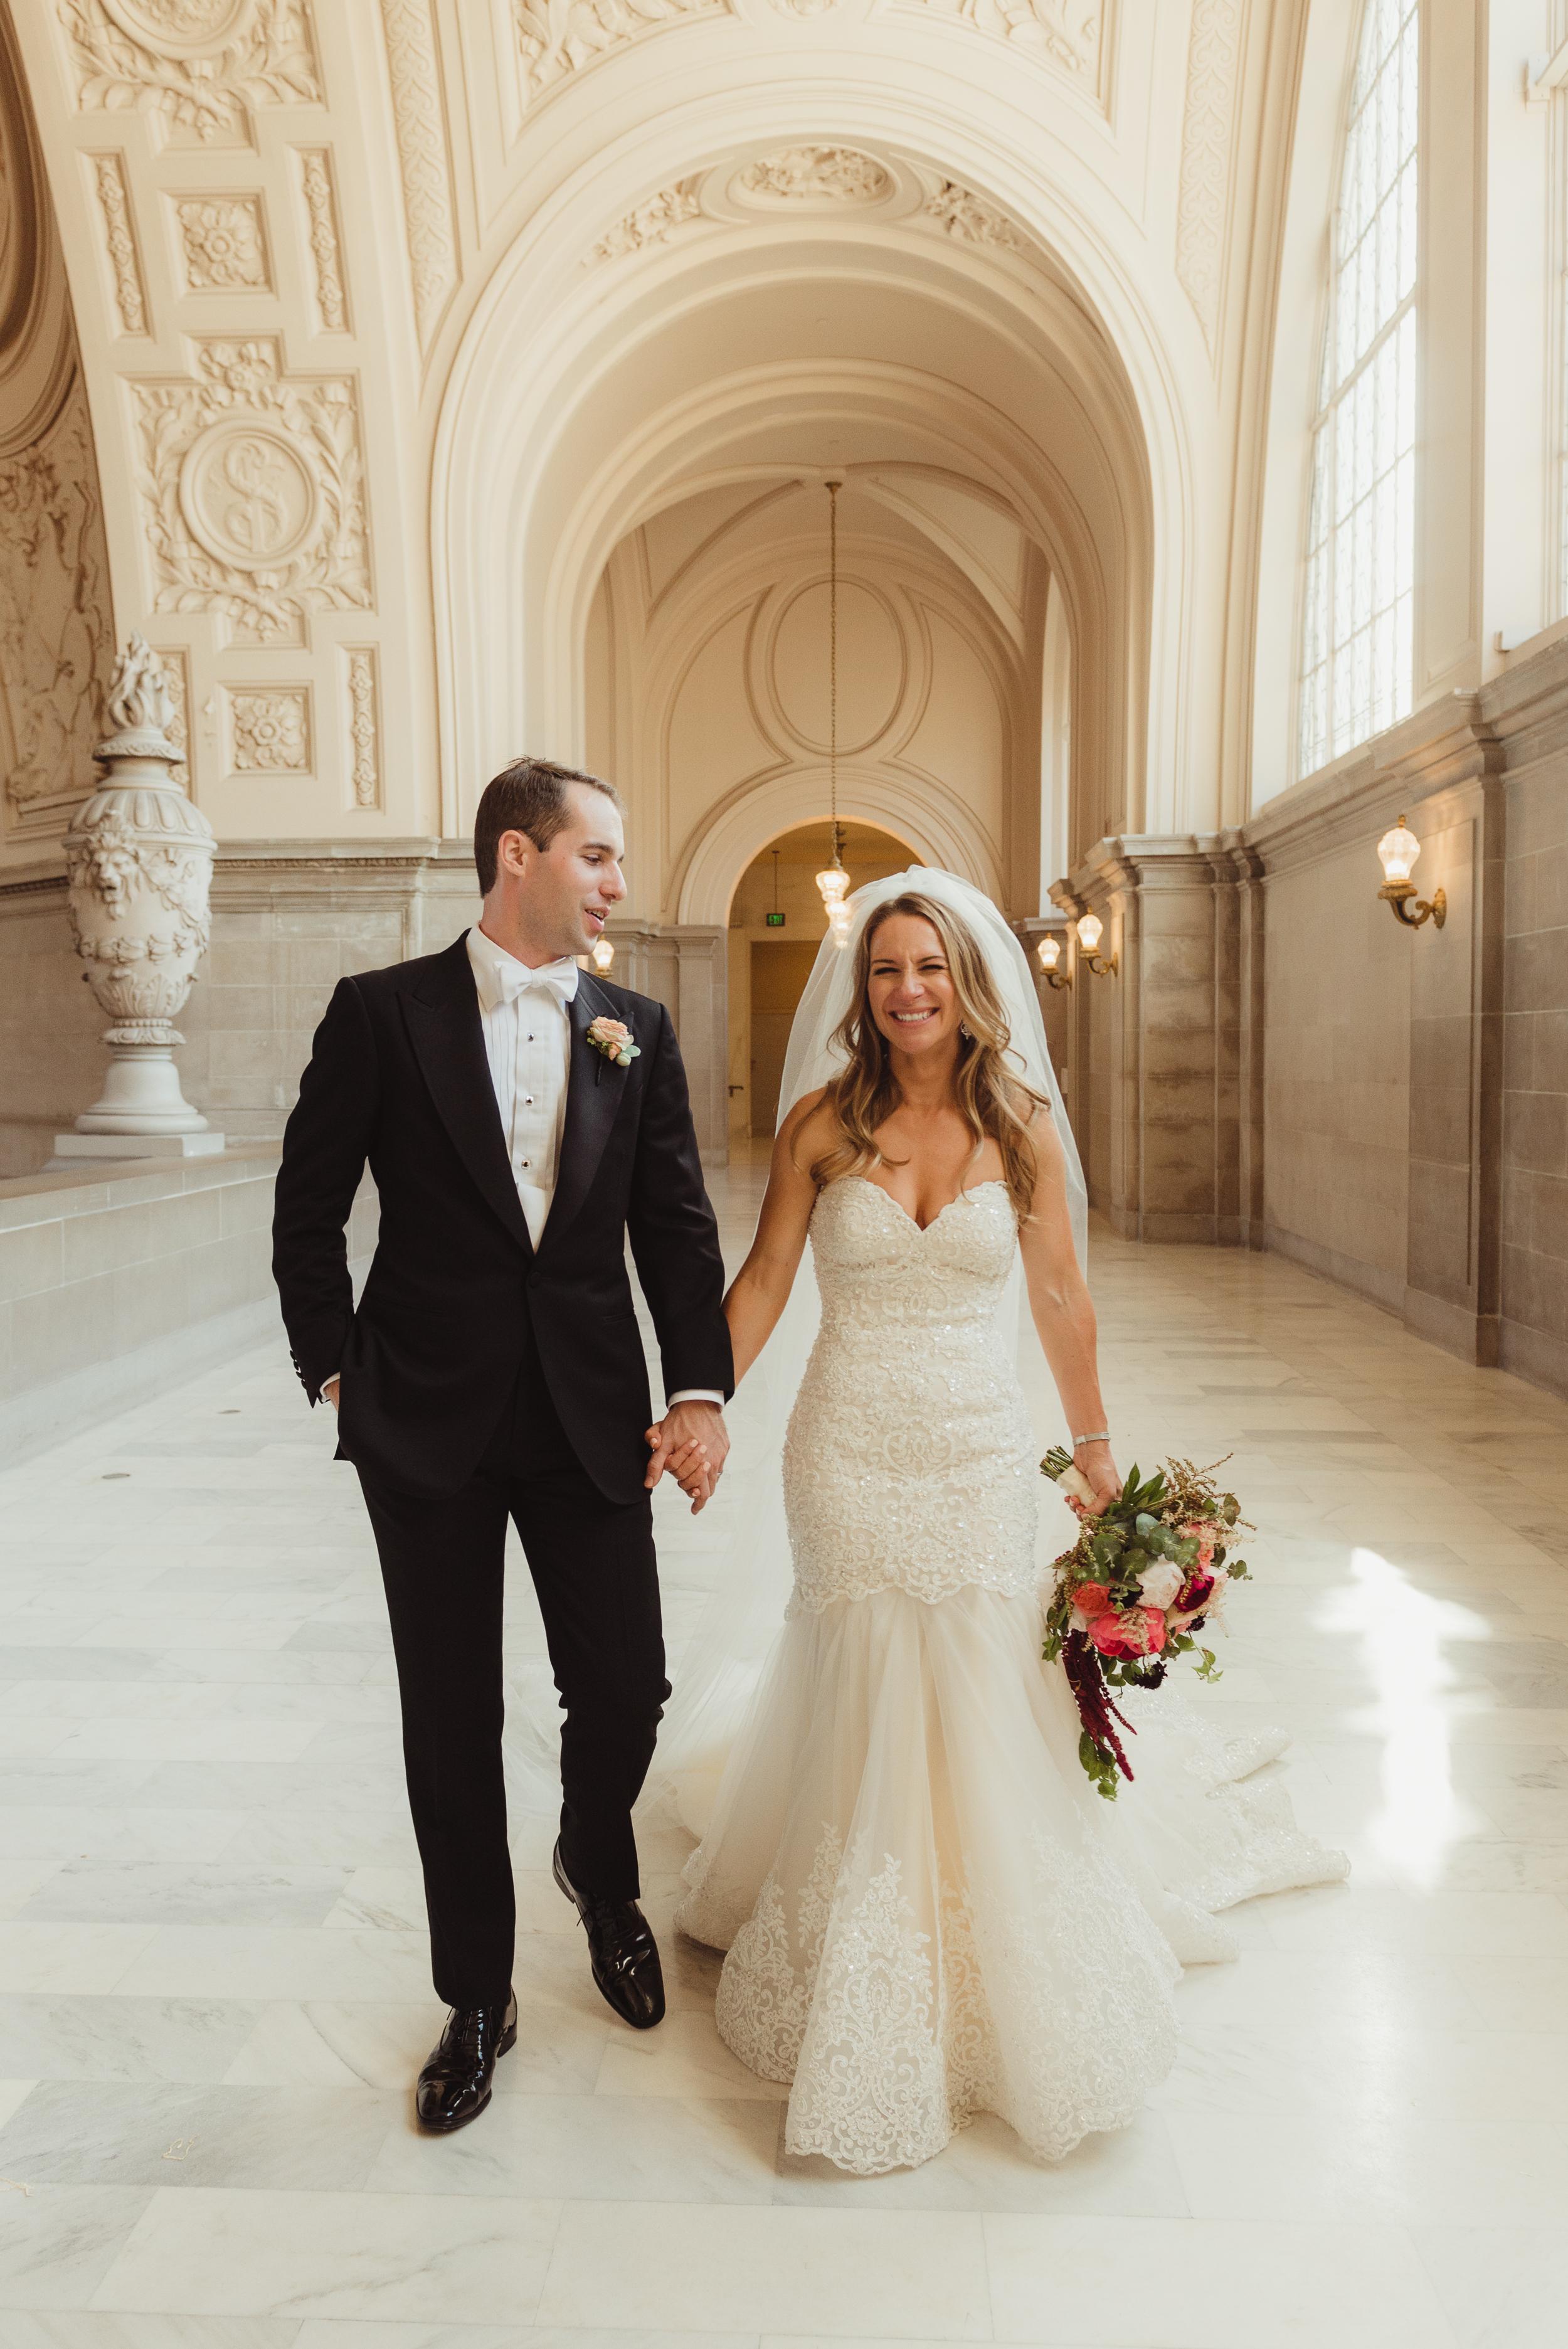 49-elegant-san-francisco-city-hall-wedding-vivianchen-0674.jpg